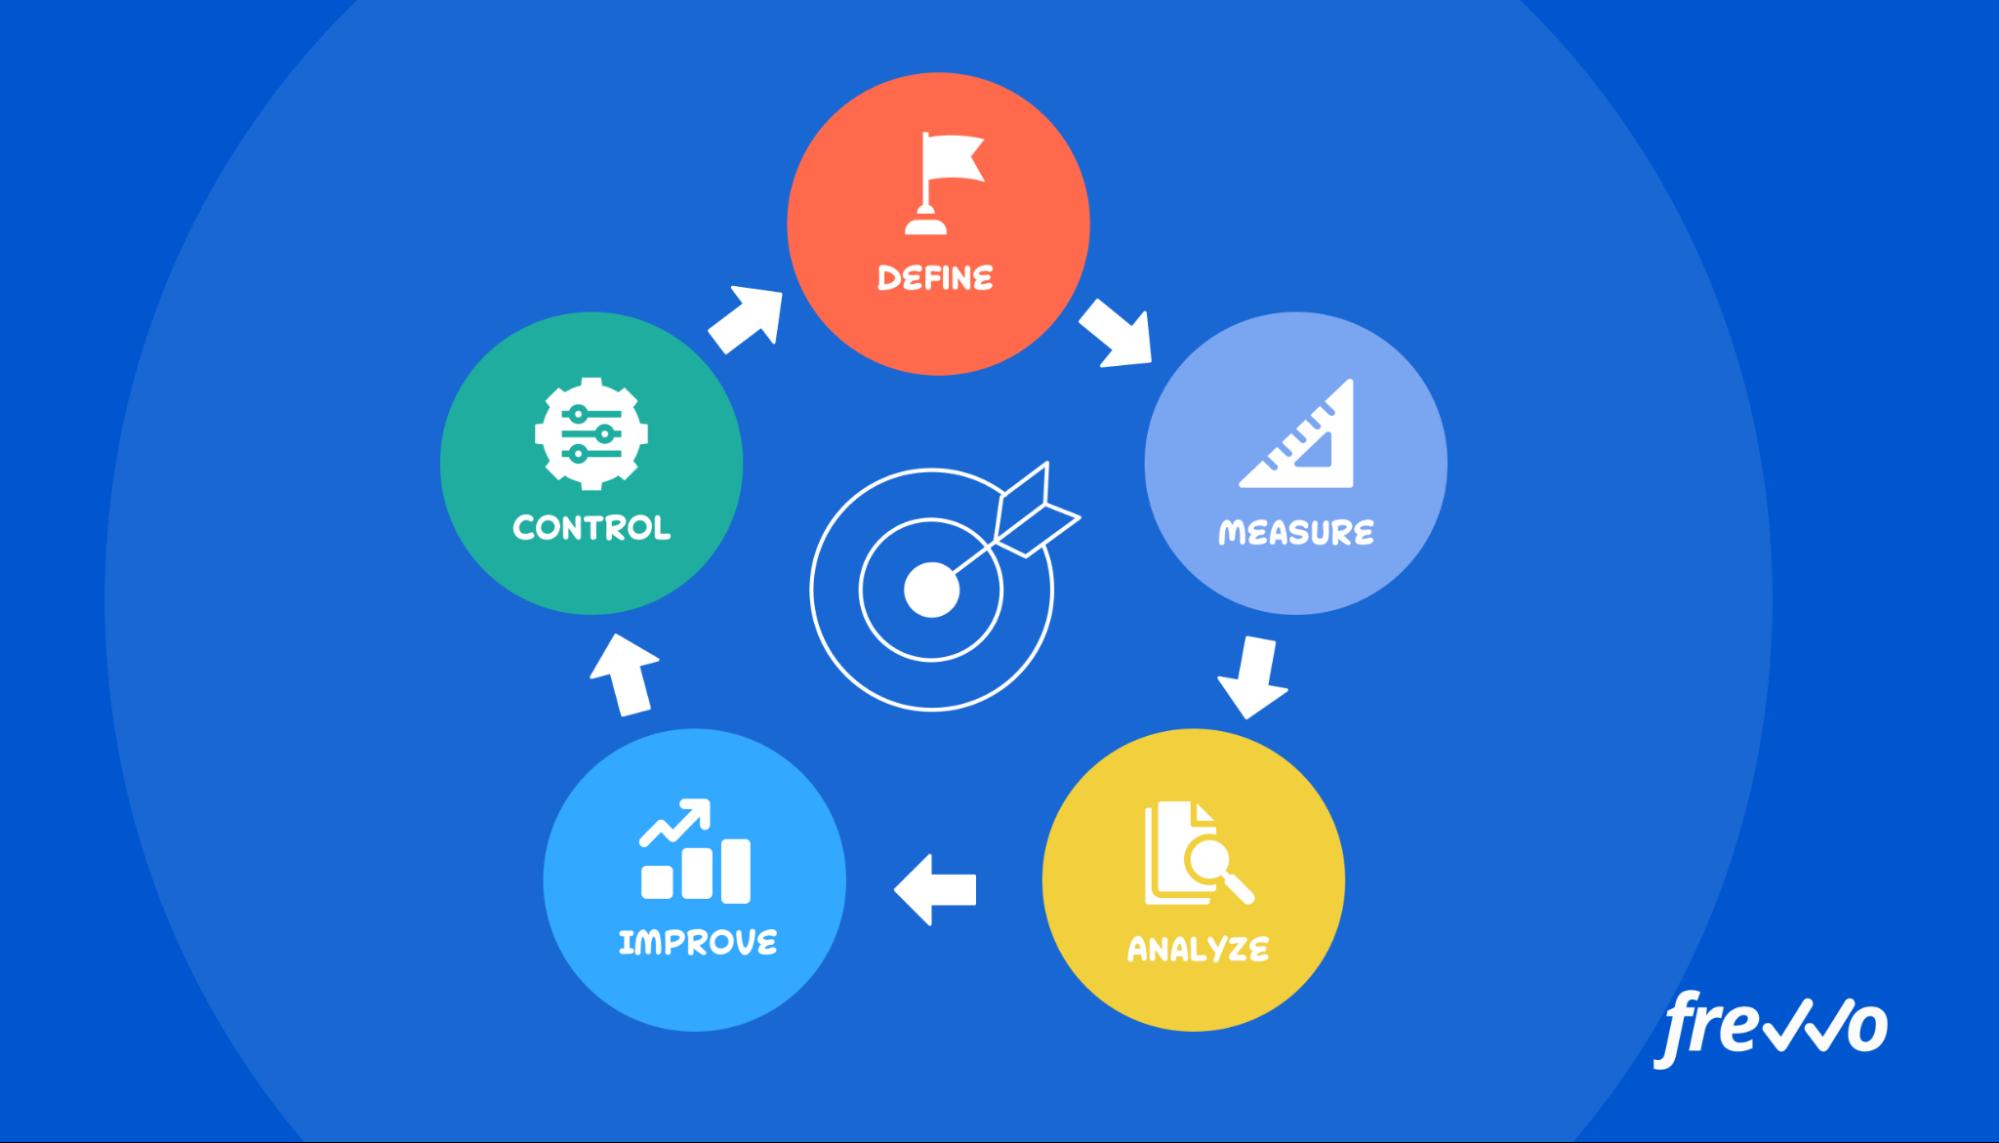 DMAIC Diagram for Six Sigma Process Improvement